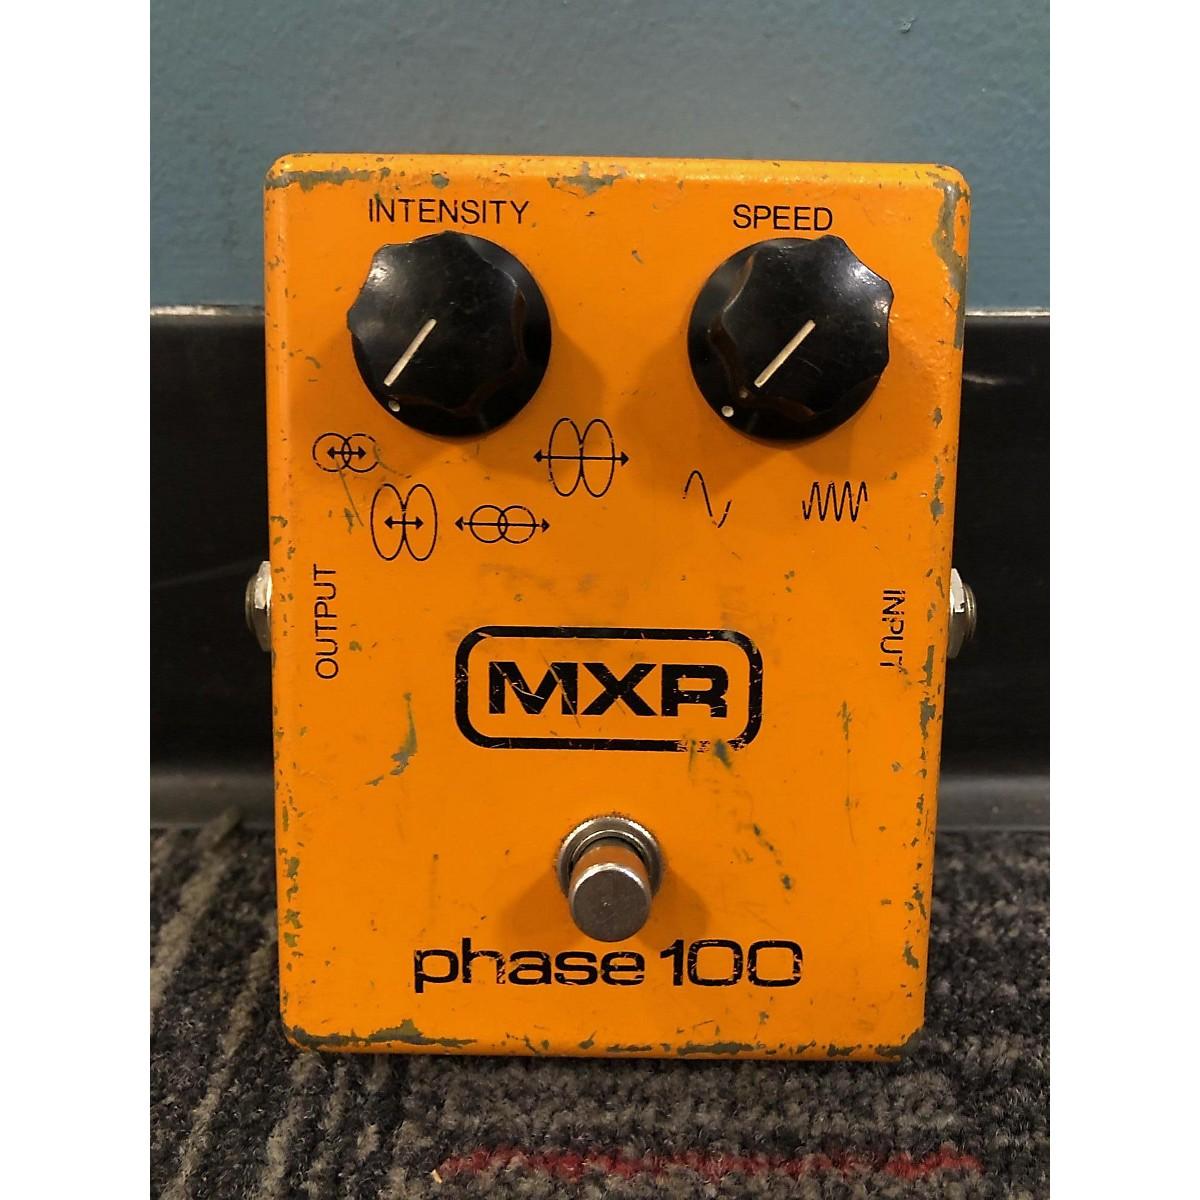 MXR 1980s Phase 100 Effect Pedal